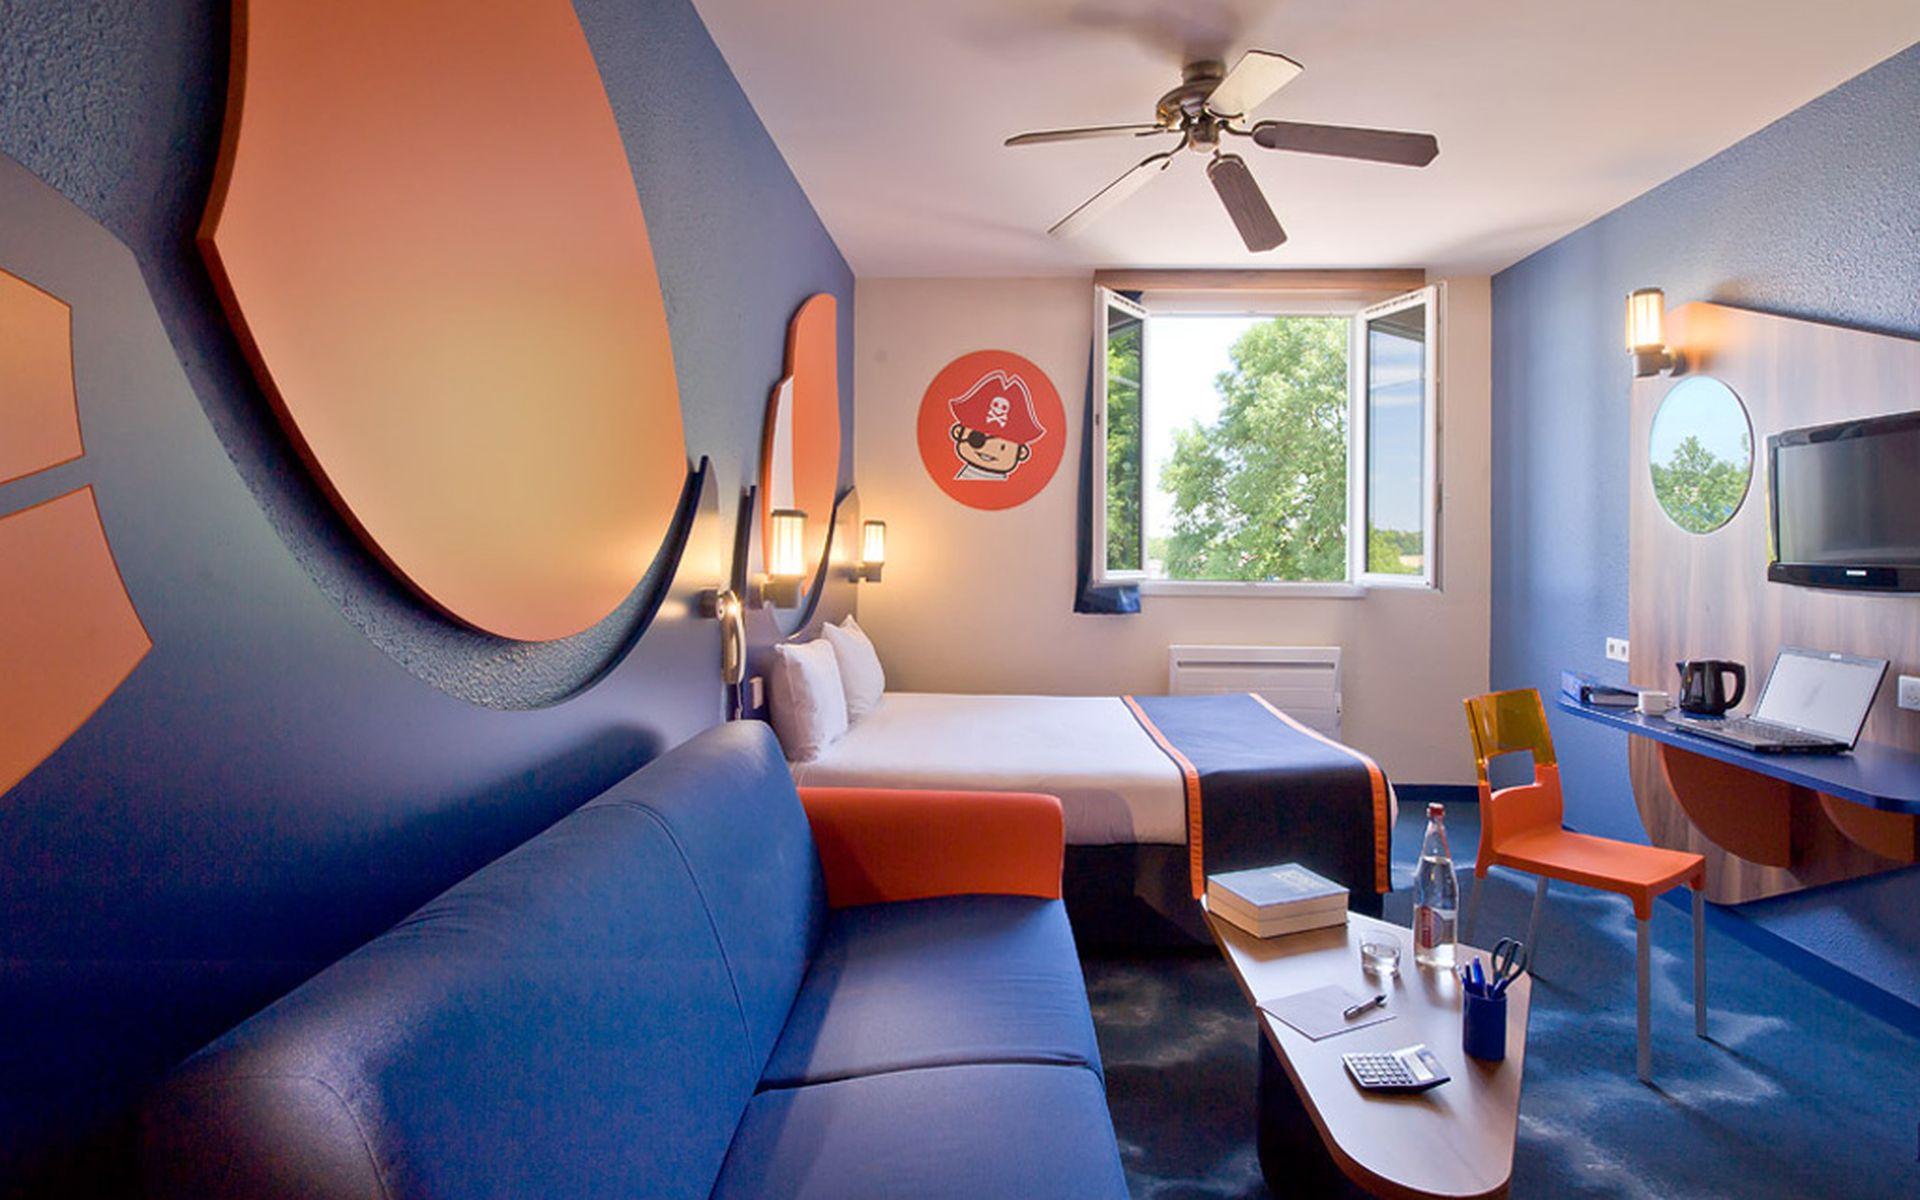 Algonquin explorers hotel disneyland par s desde 36 for Habitacion familiar disneyland paris